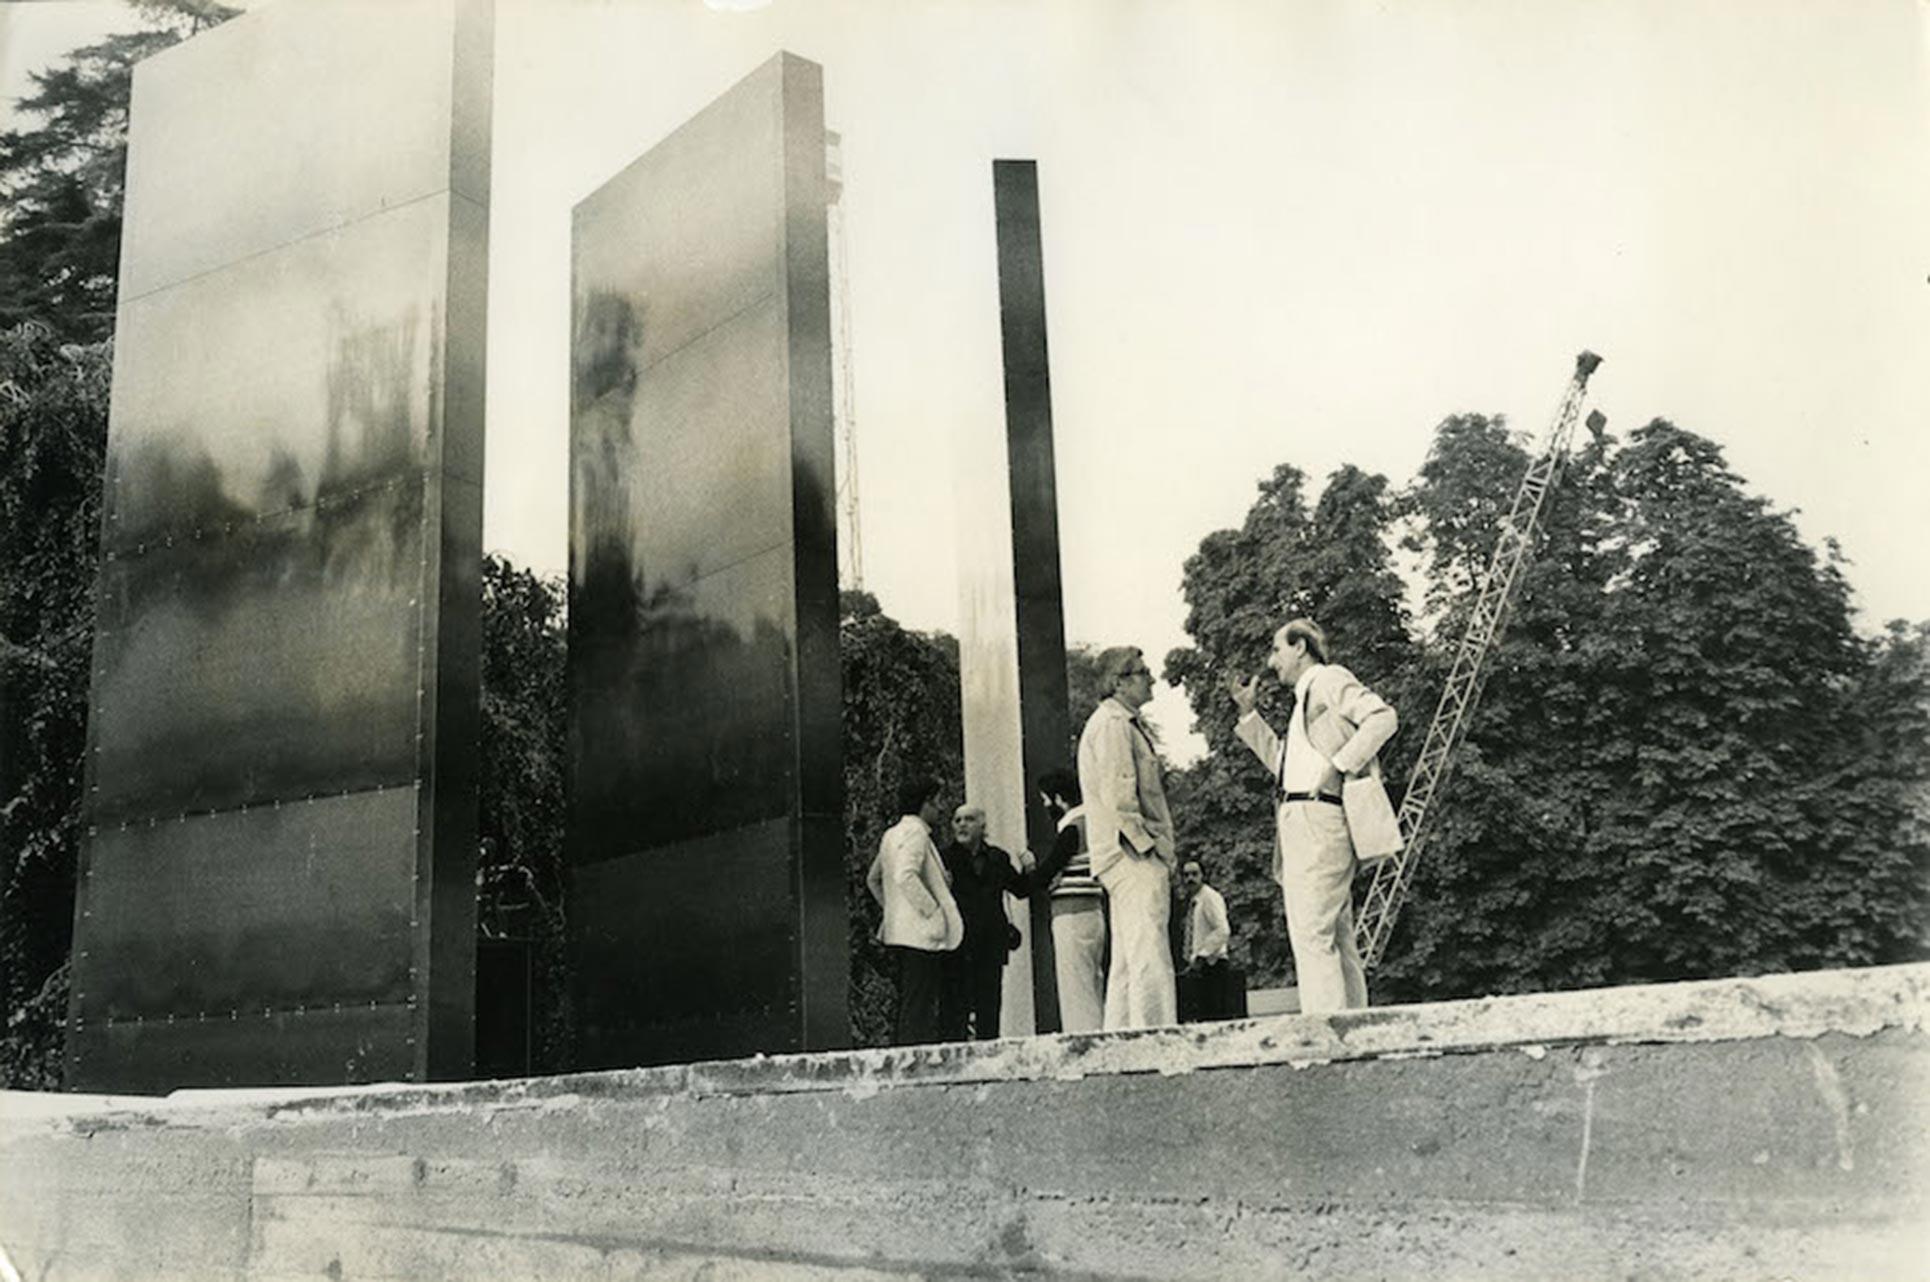 Teatro Continuo, Alberto Burri, reconstruction 2015 of the original 1972 work on the picture, in Sempione park in Milan